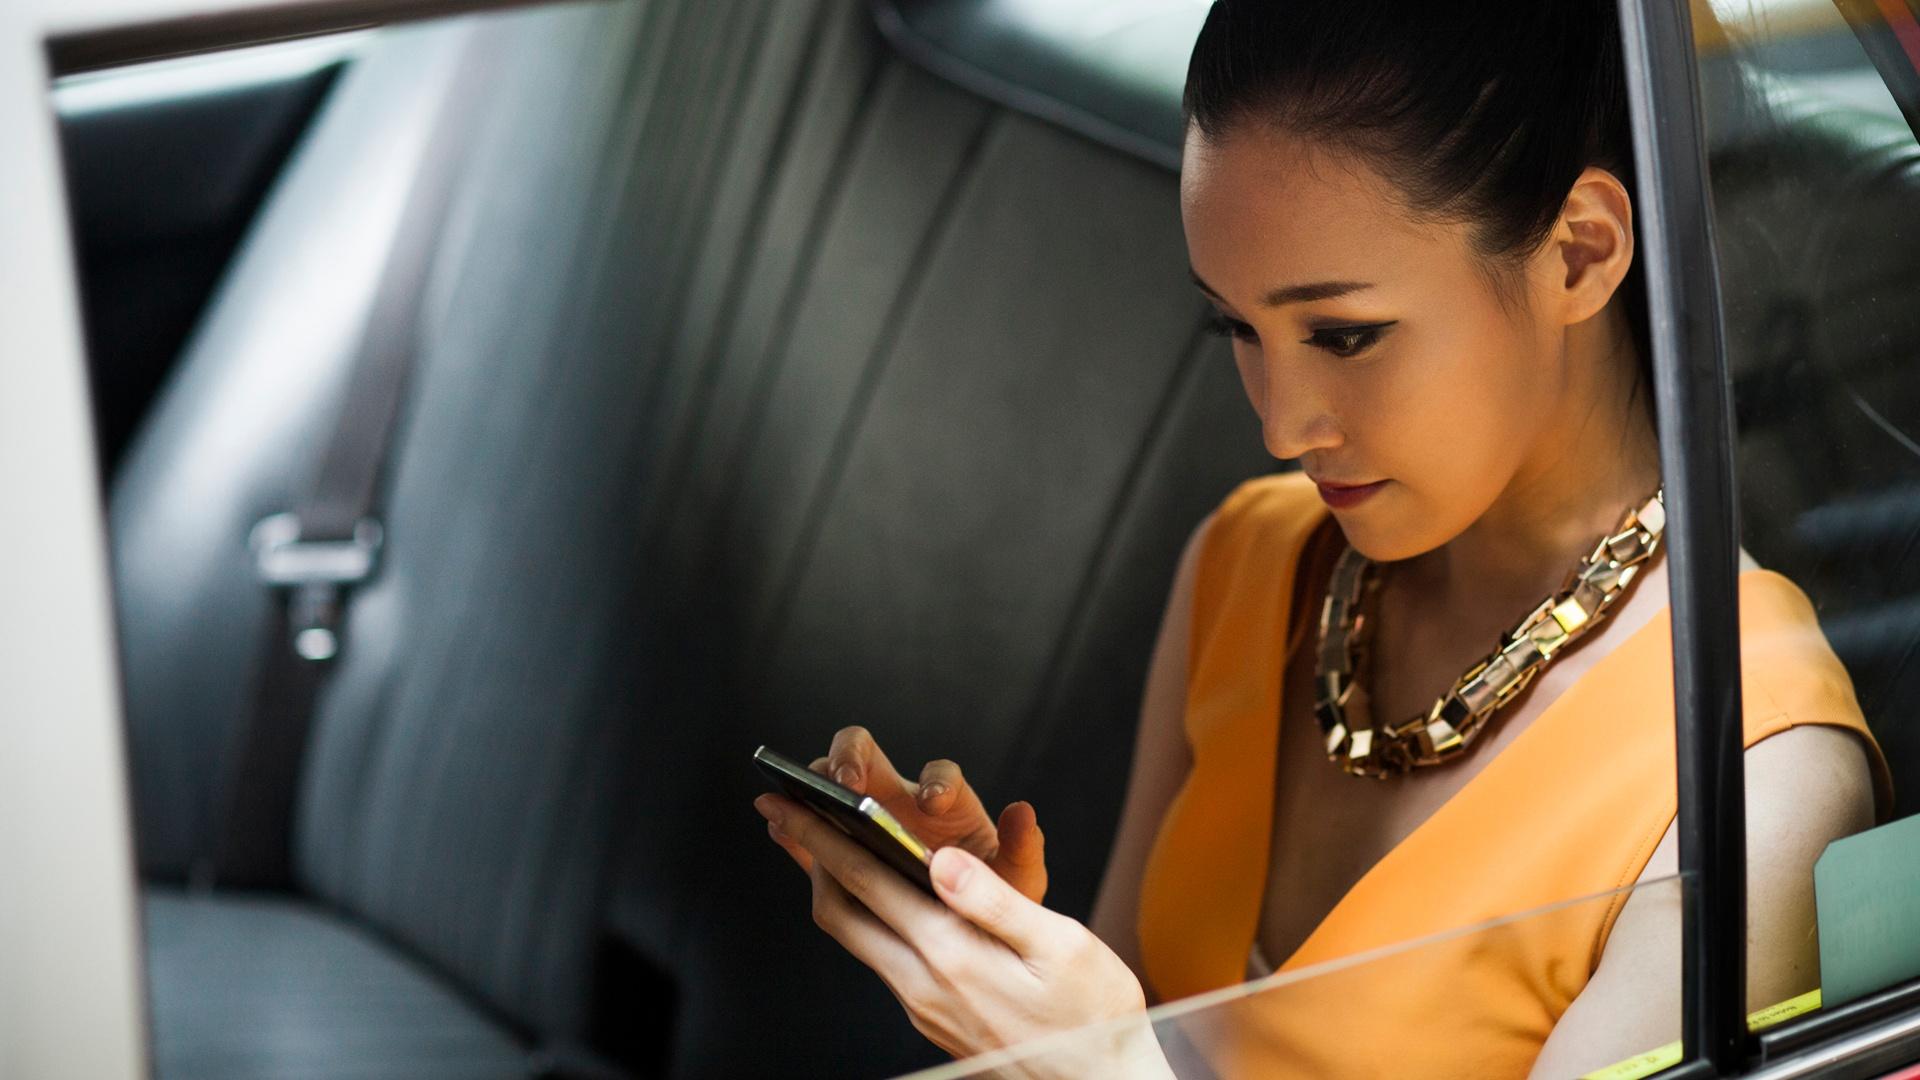 Building brand awareness through WeChat marketing